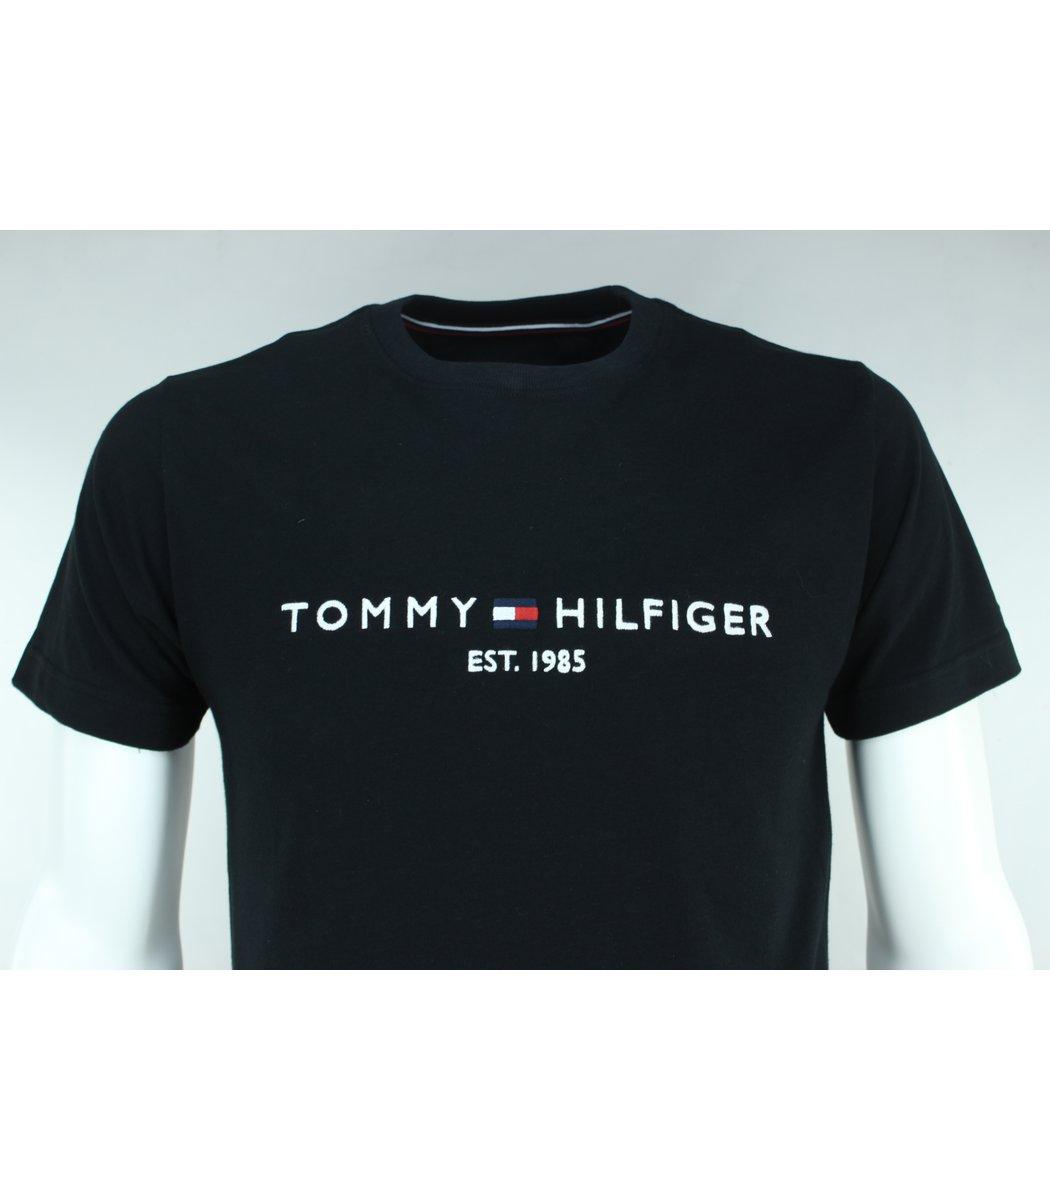 Чёрная футболка Tommy Hilfiger с вышивкой FT3